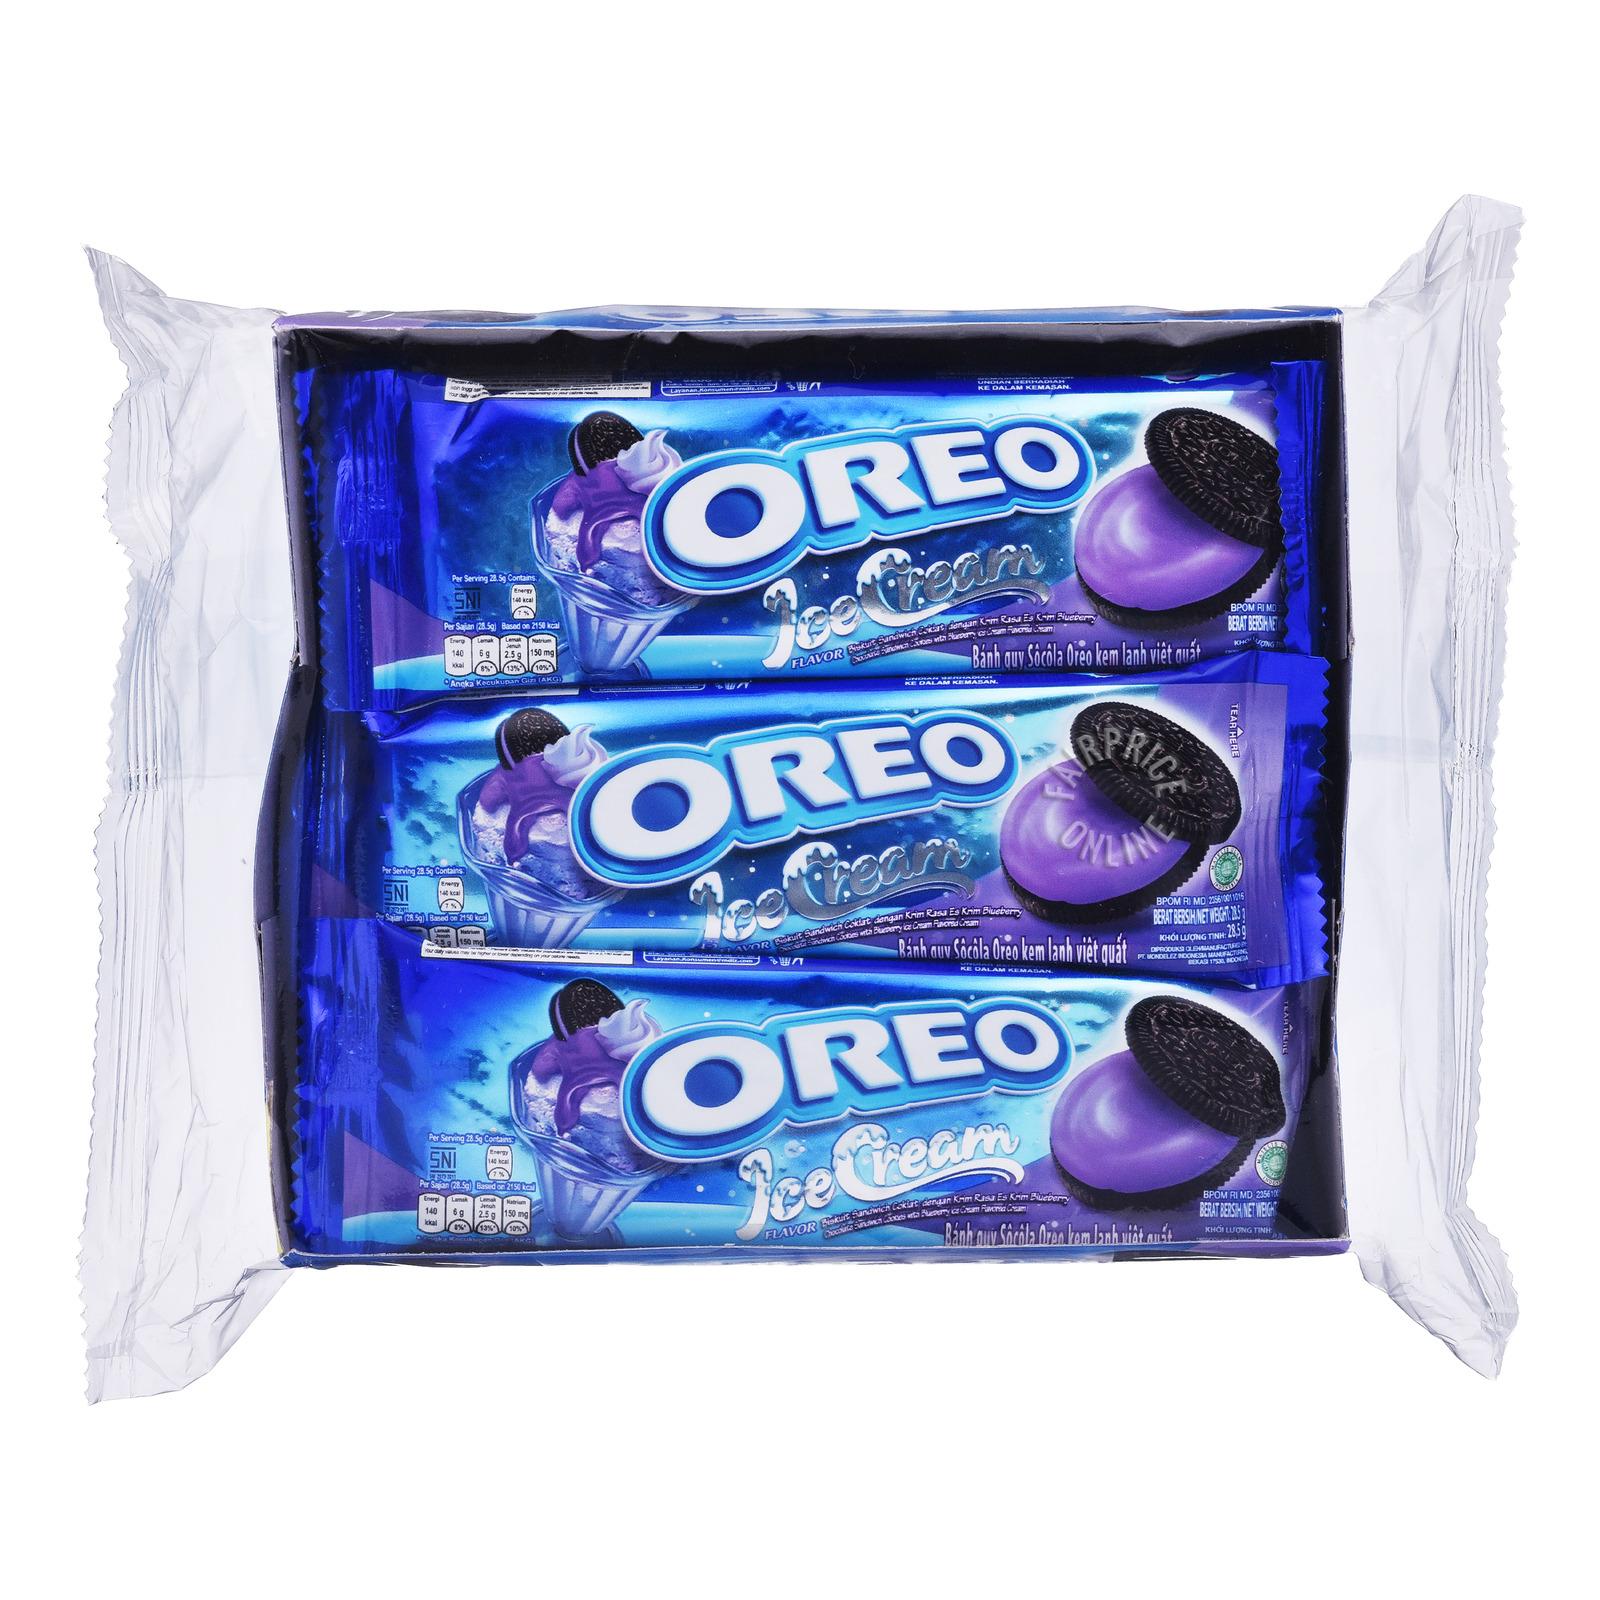 Oreo Cookie Sandwich - Blueberry